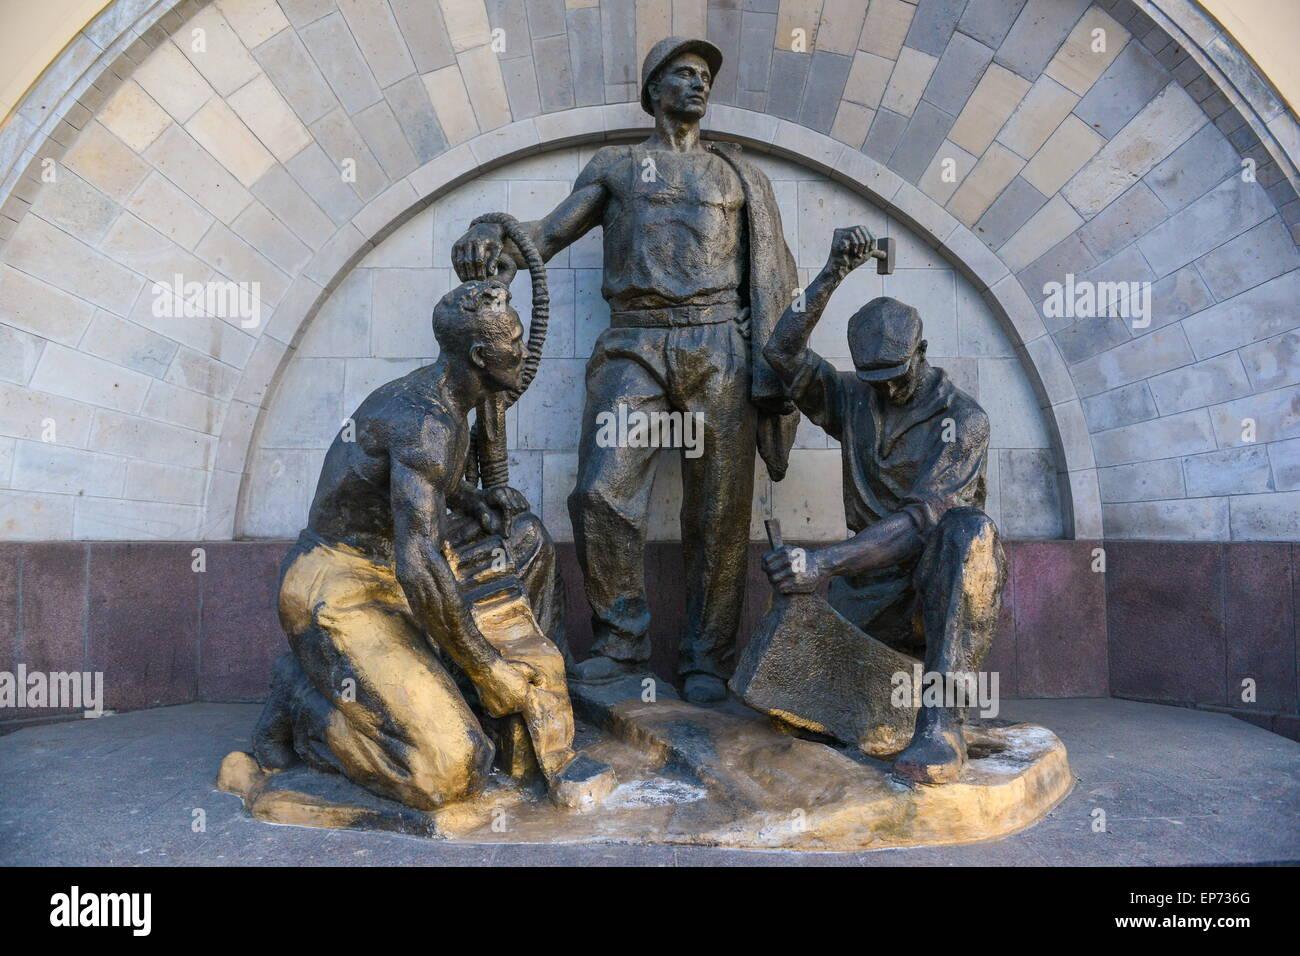 Vladislav Galkin will be erected a monument 11.03.2010 10